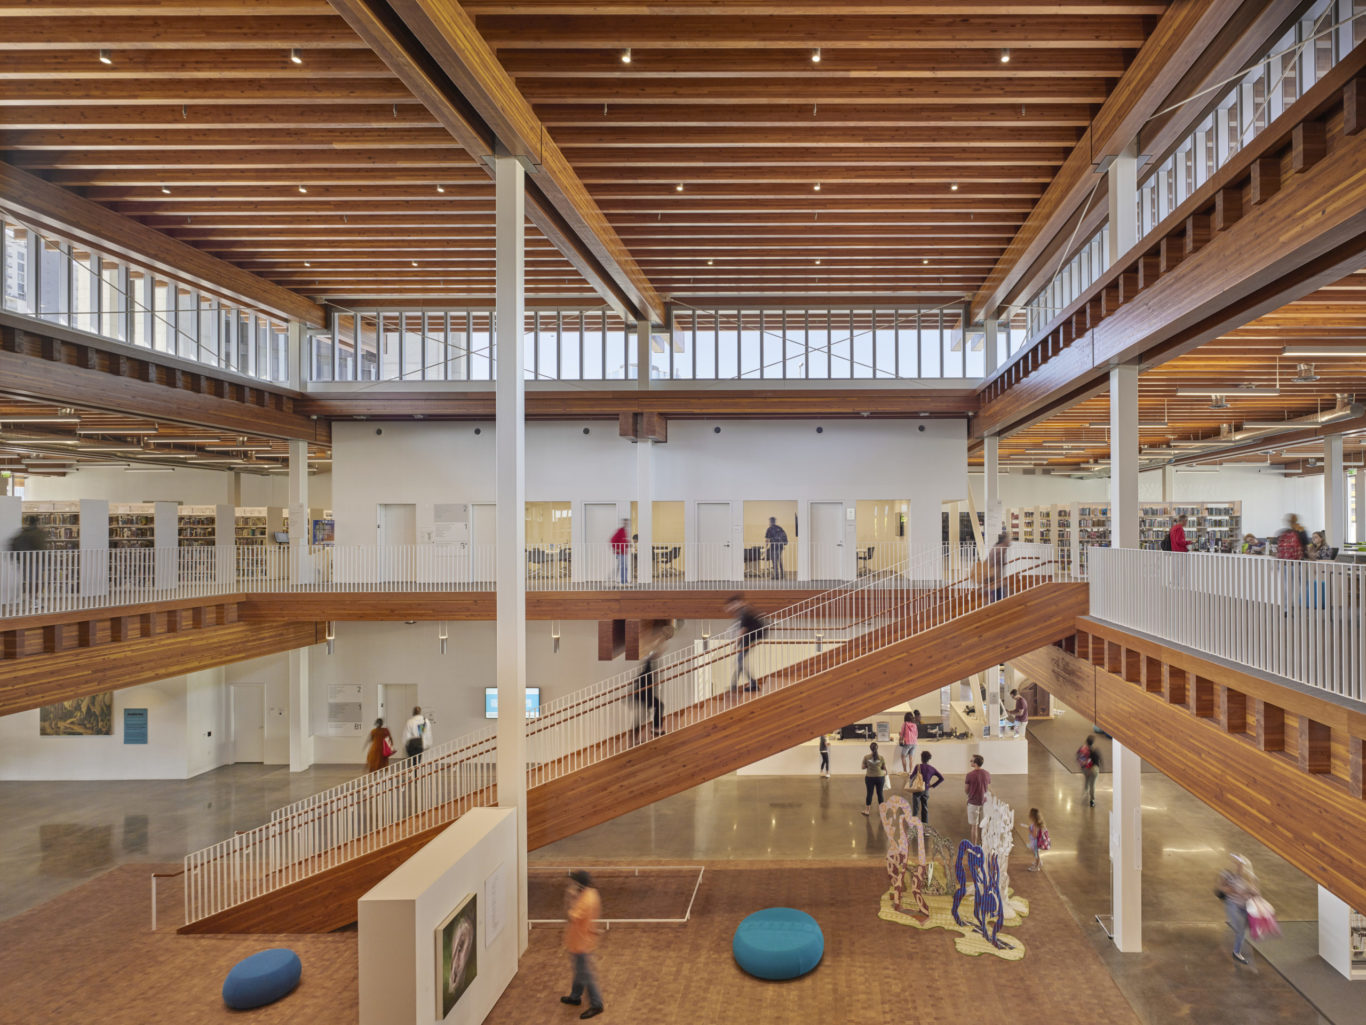 Slide 1 of 1, Billie Jean King Library timber construction